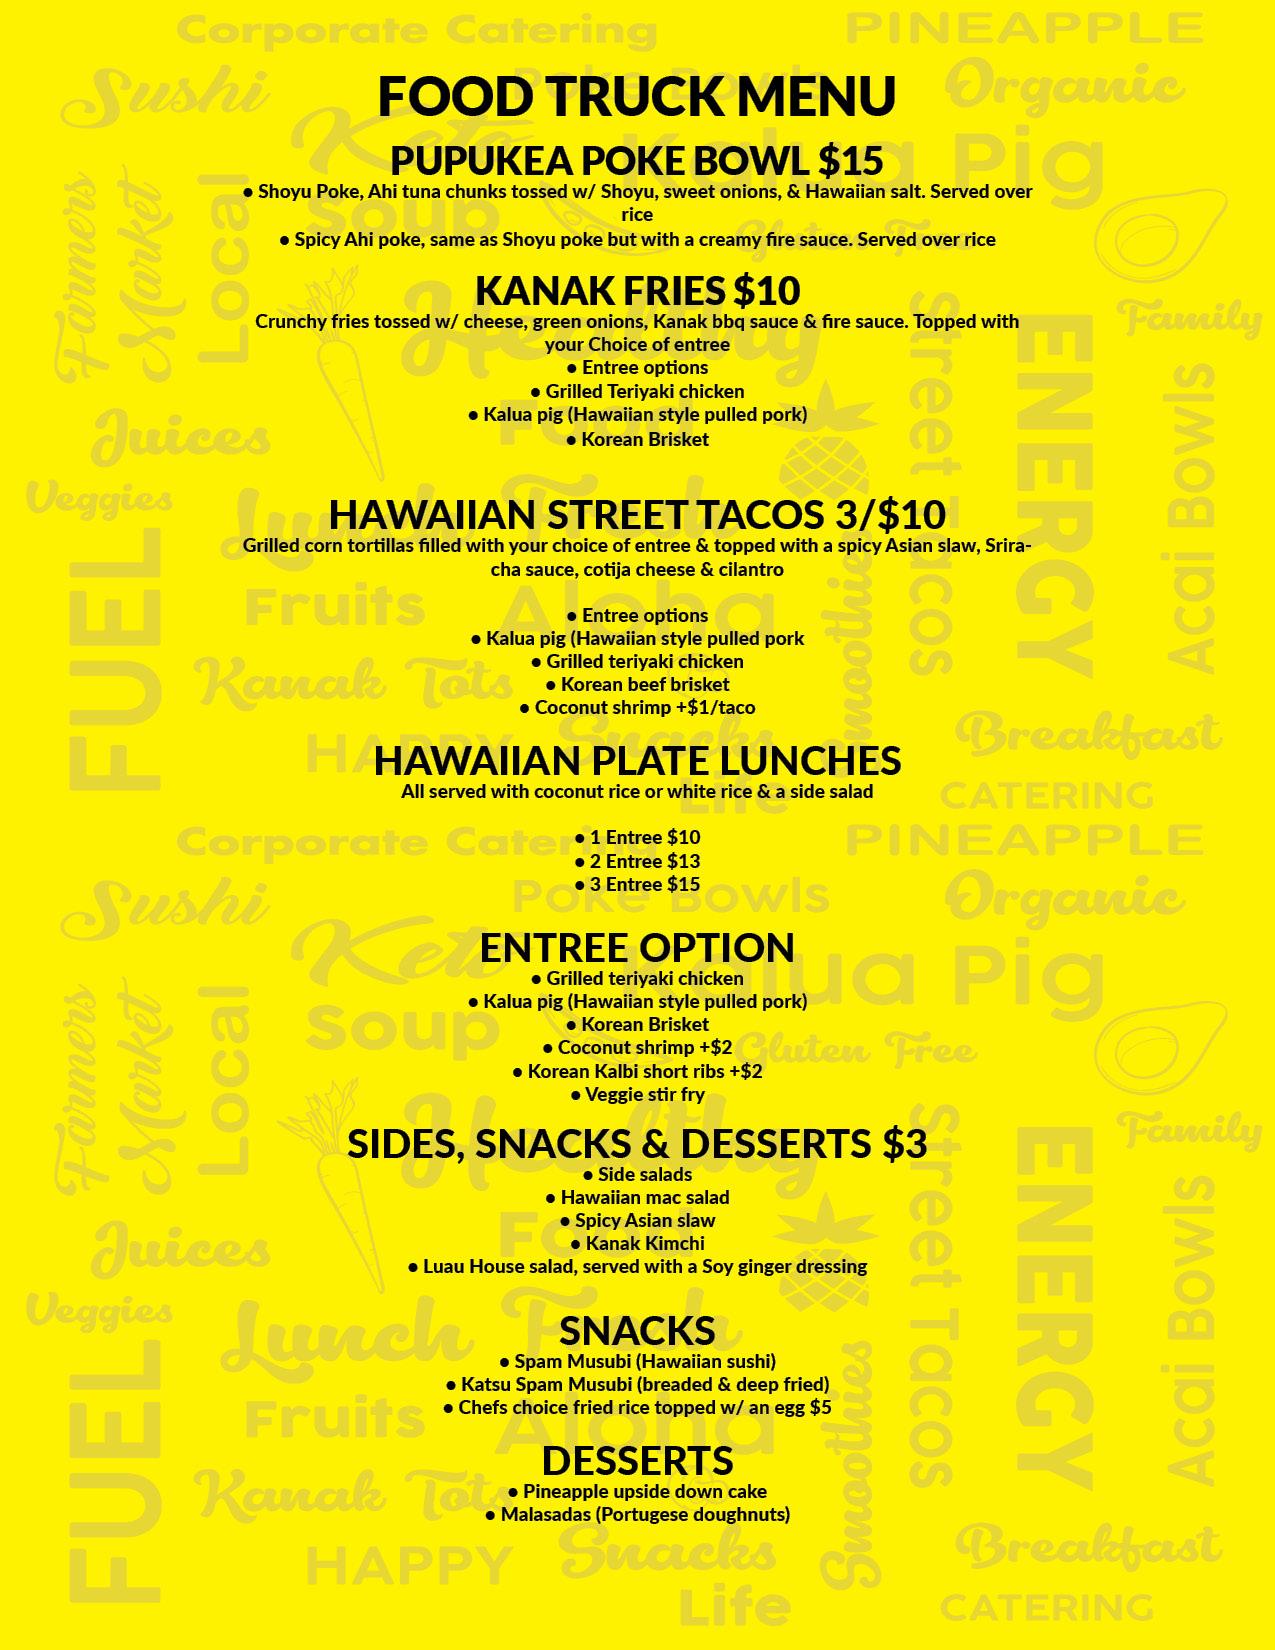 Kanak attack menu